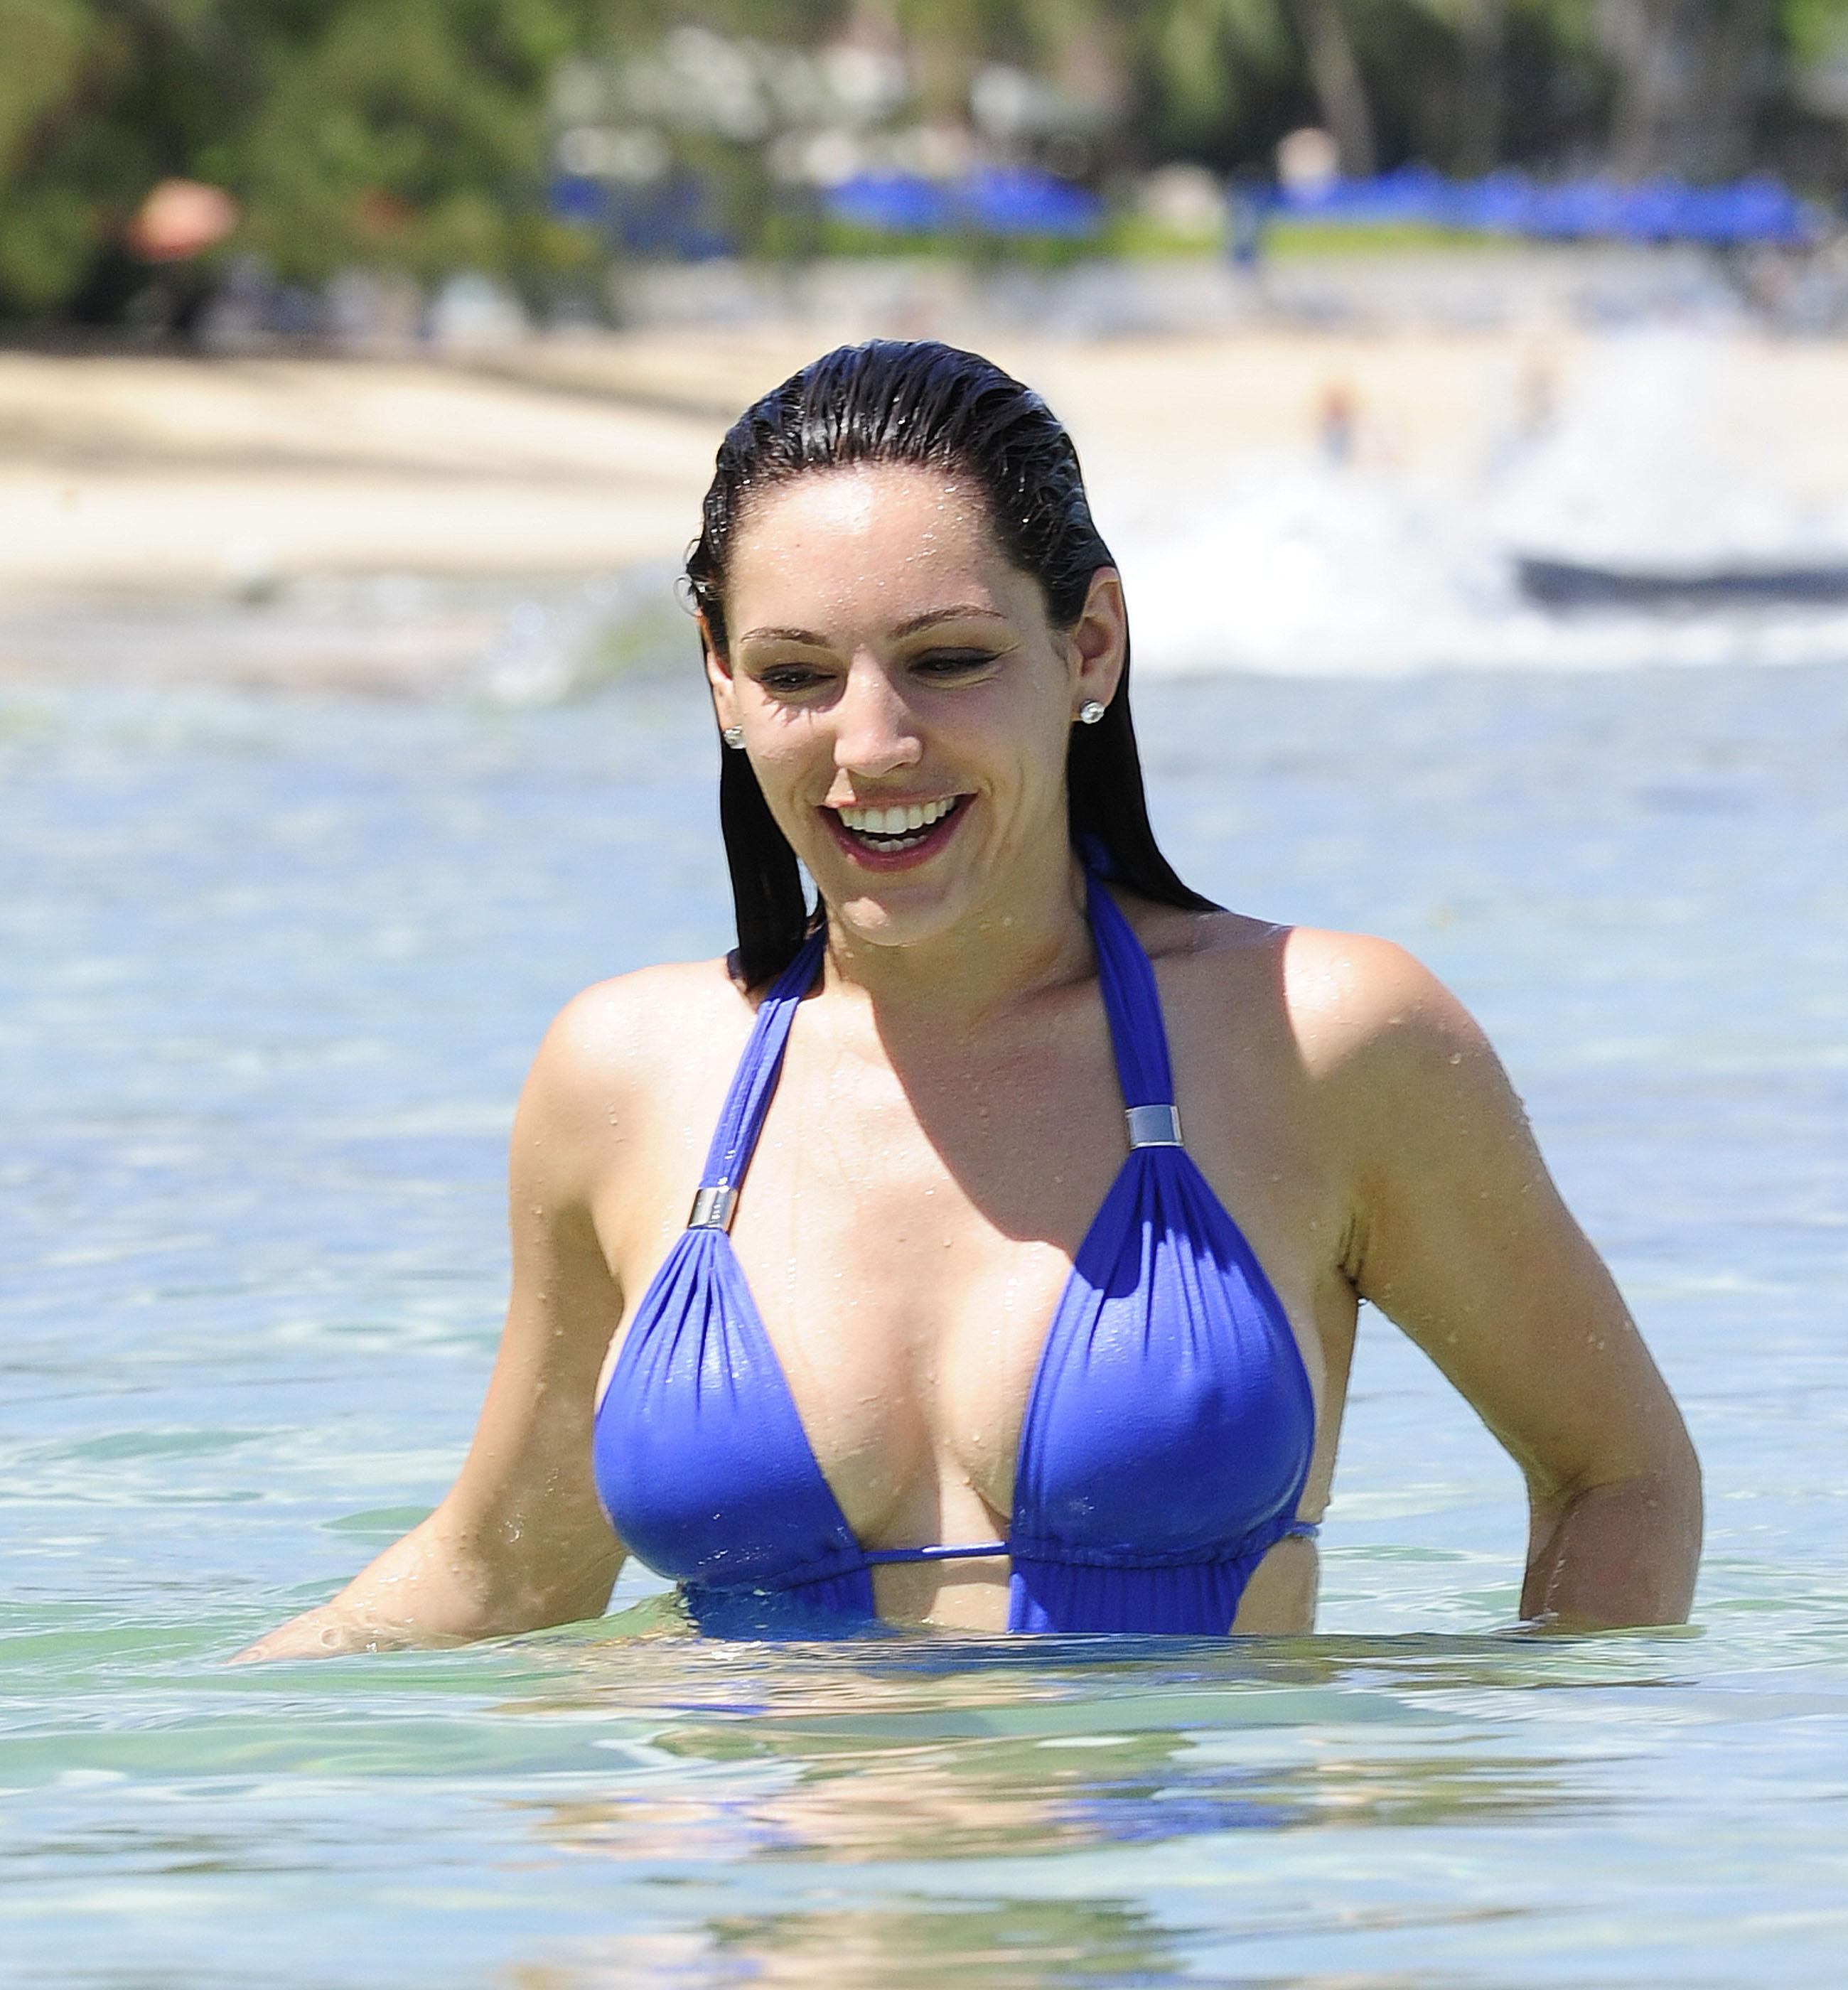 51405_Kelly_Brook_On_The_Beach_In_Barbados.10_HQ_007_122_364lo.jpg